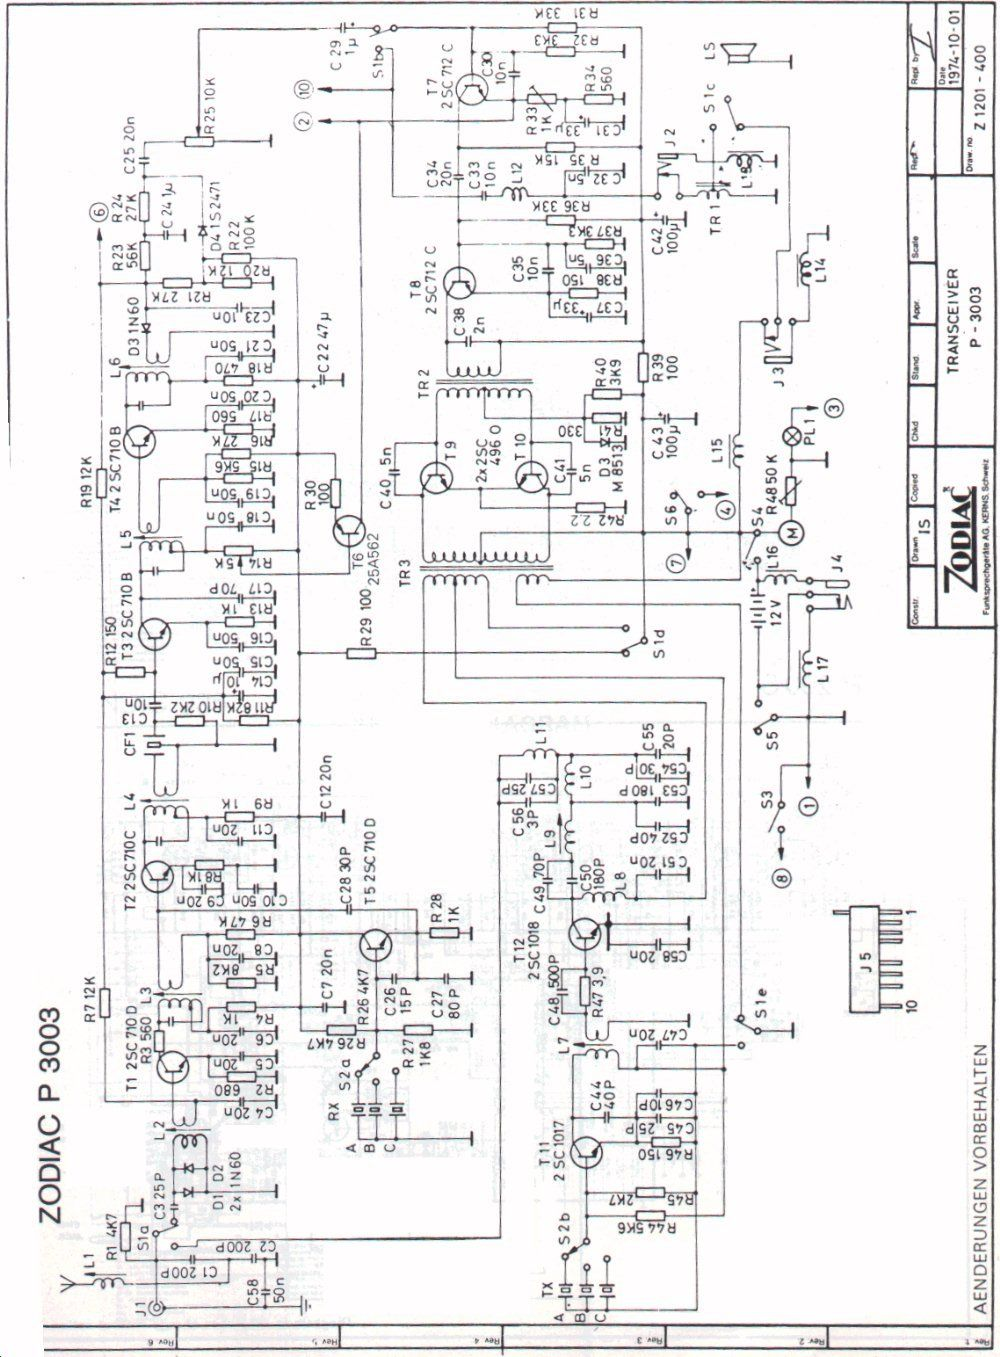 schemi elettrici vari